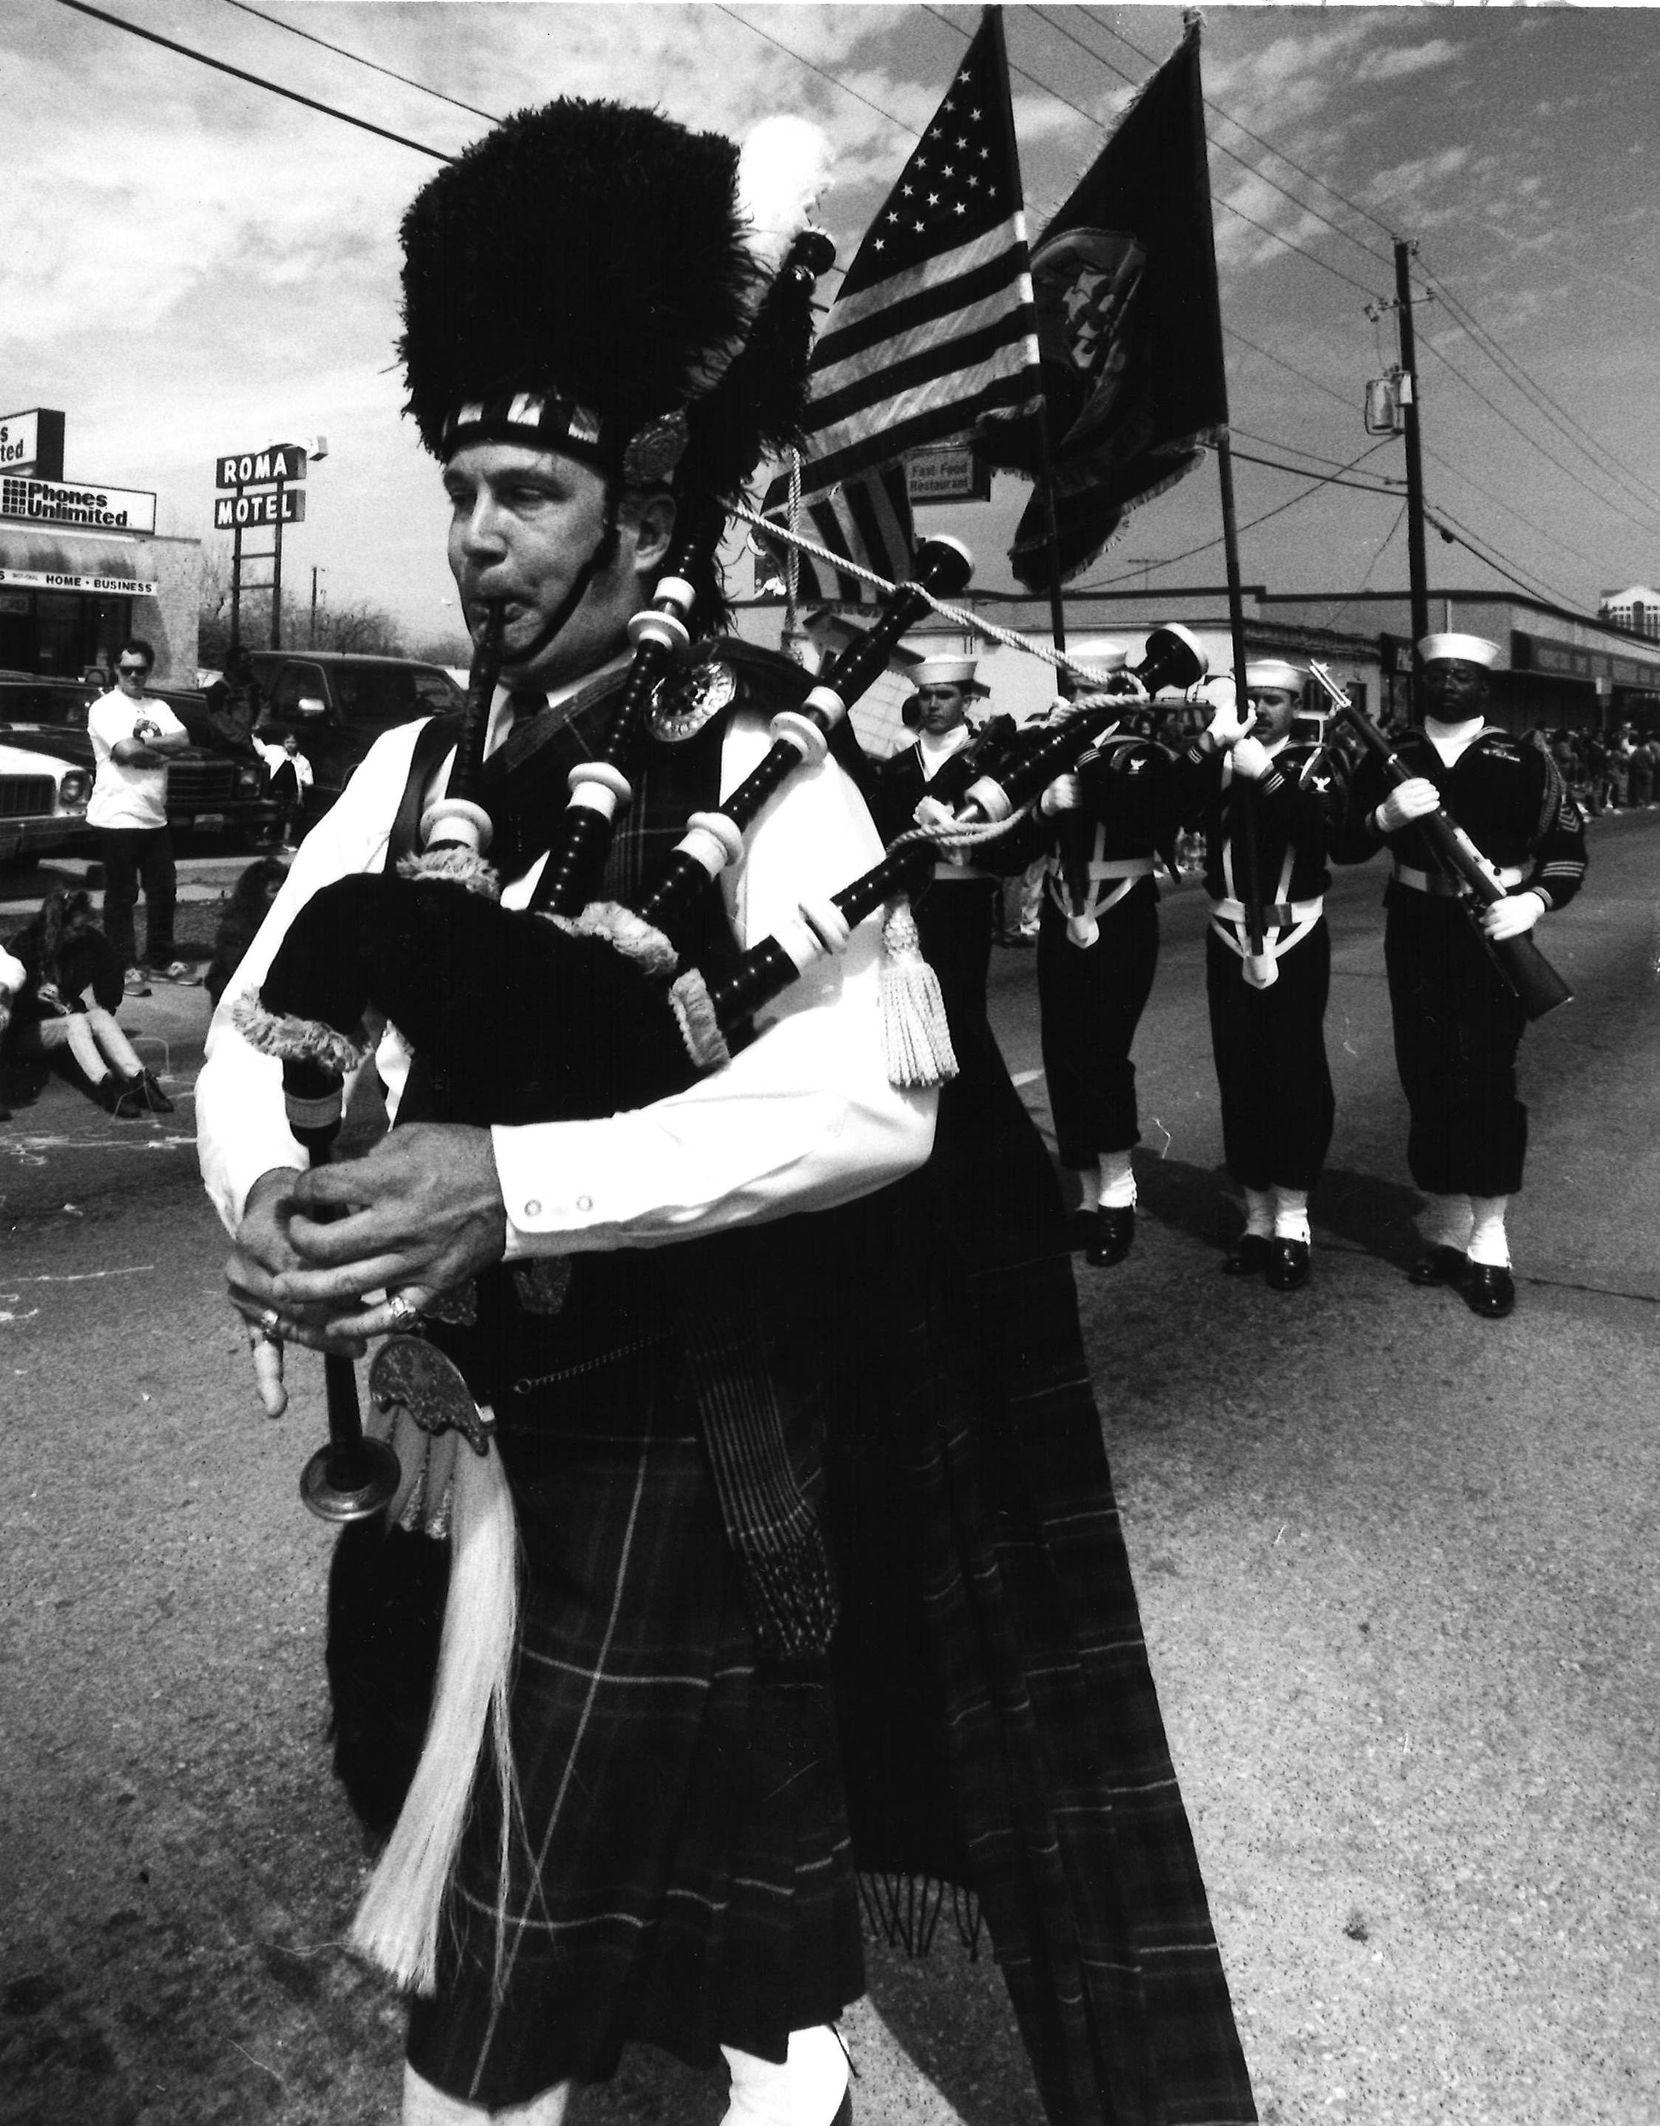 March 16, 1992: Greenville Avenue Saint Patrick's Day parade